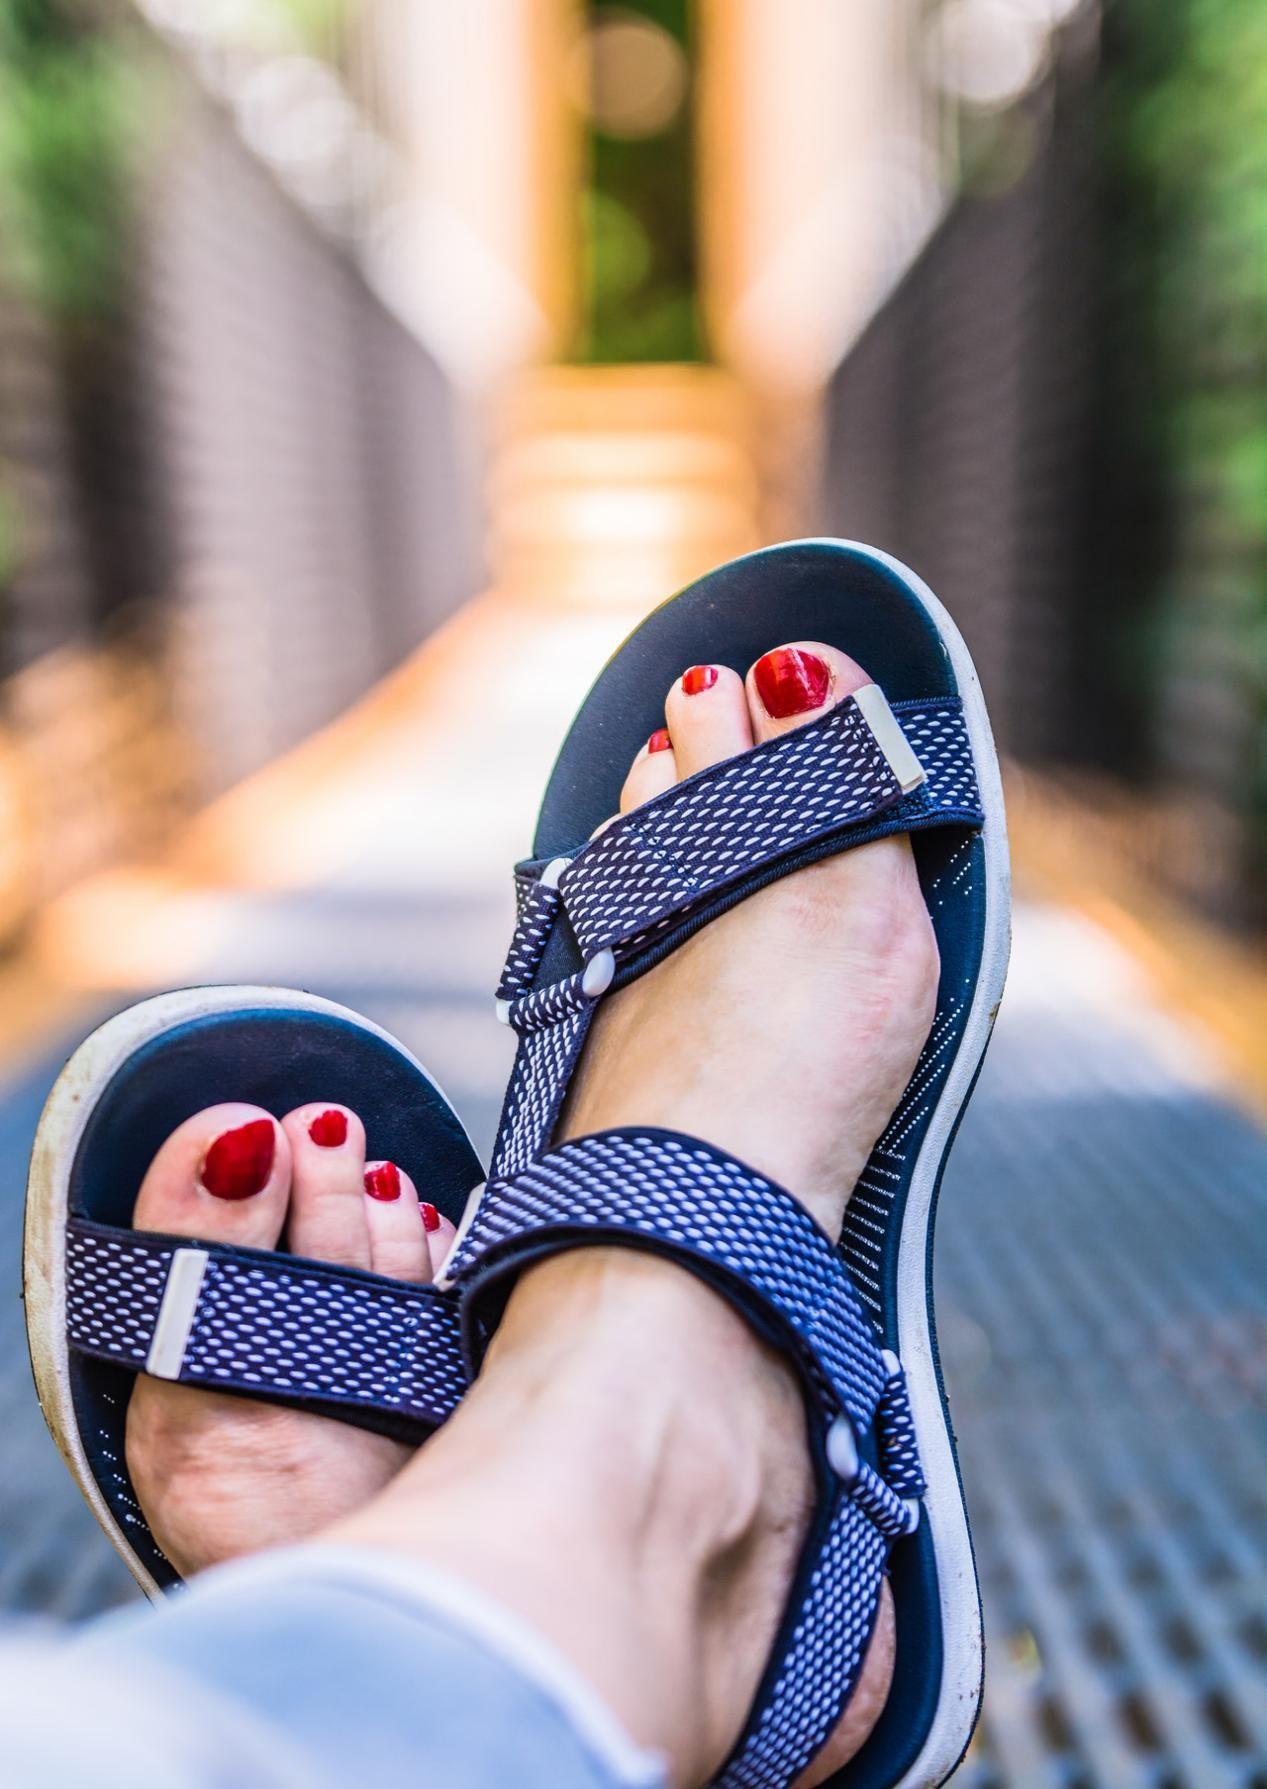 comfortable wear as remedy for ingrown toenail